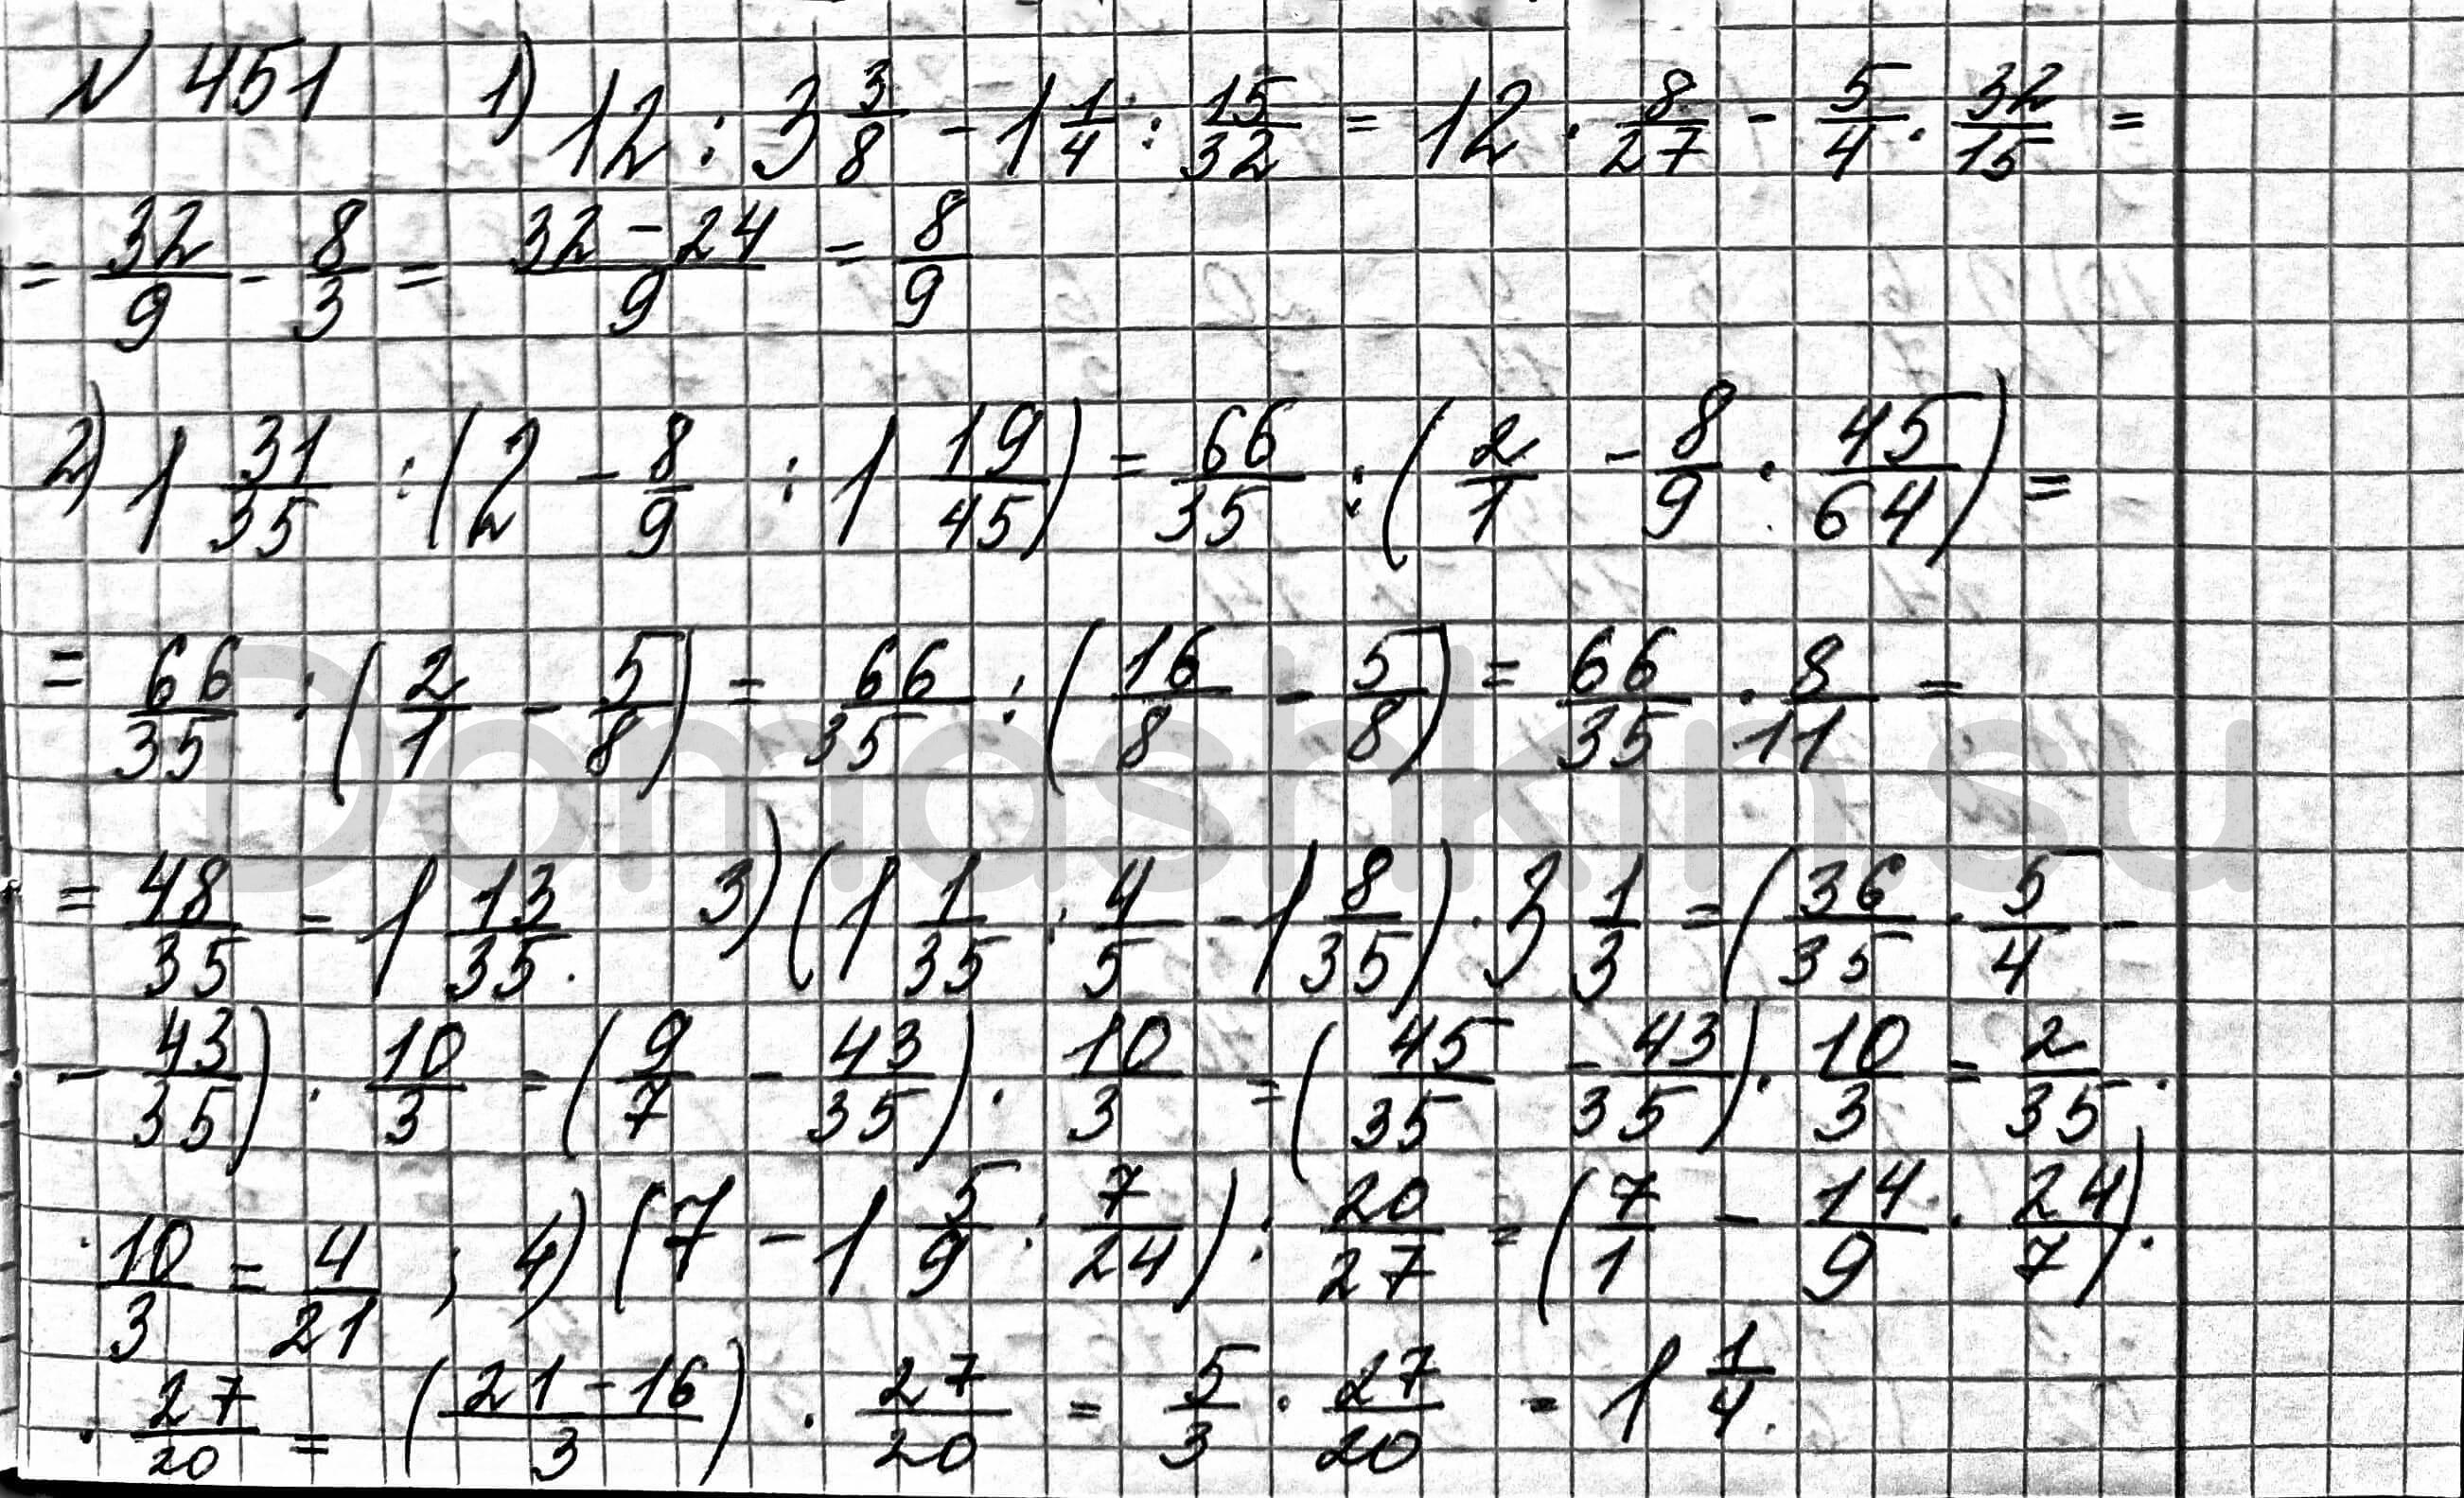 Математика 6 класс учебник Мерзляк номер 451 решение